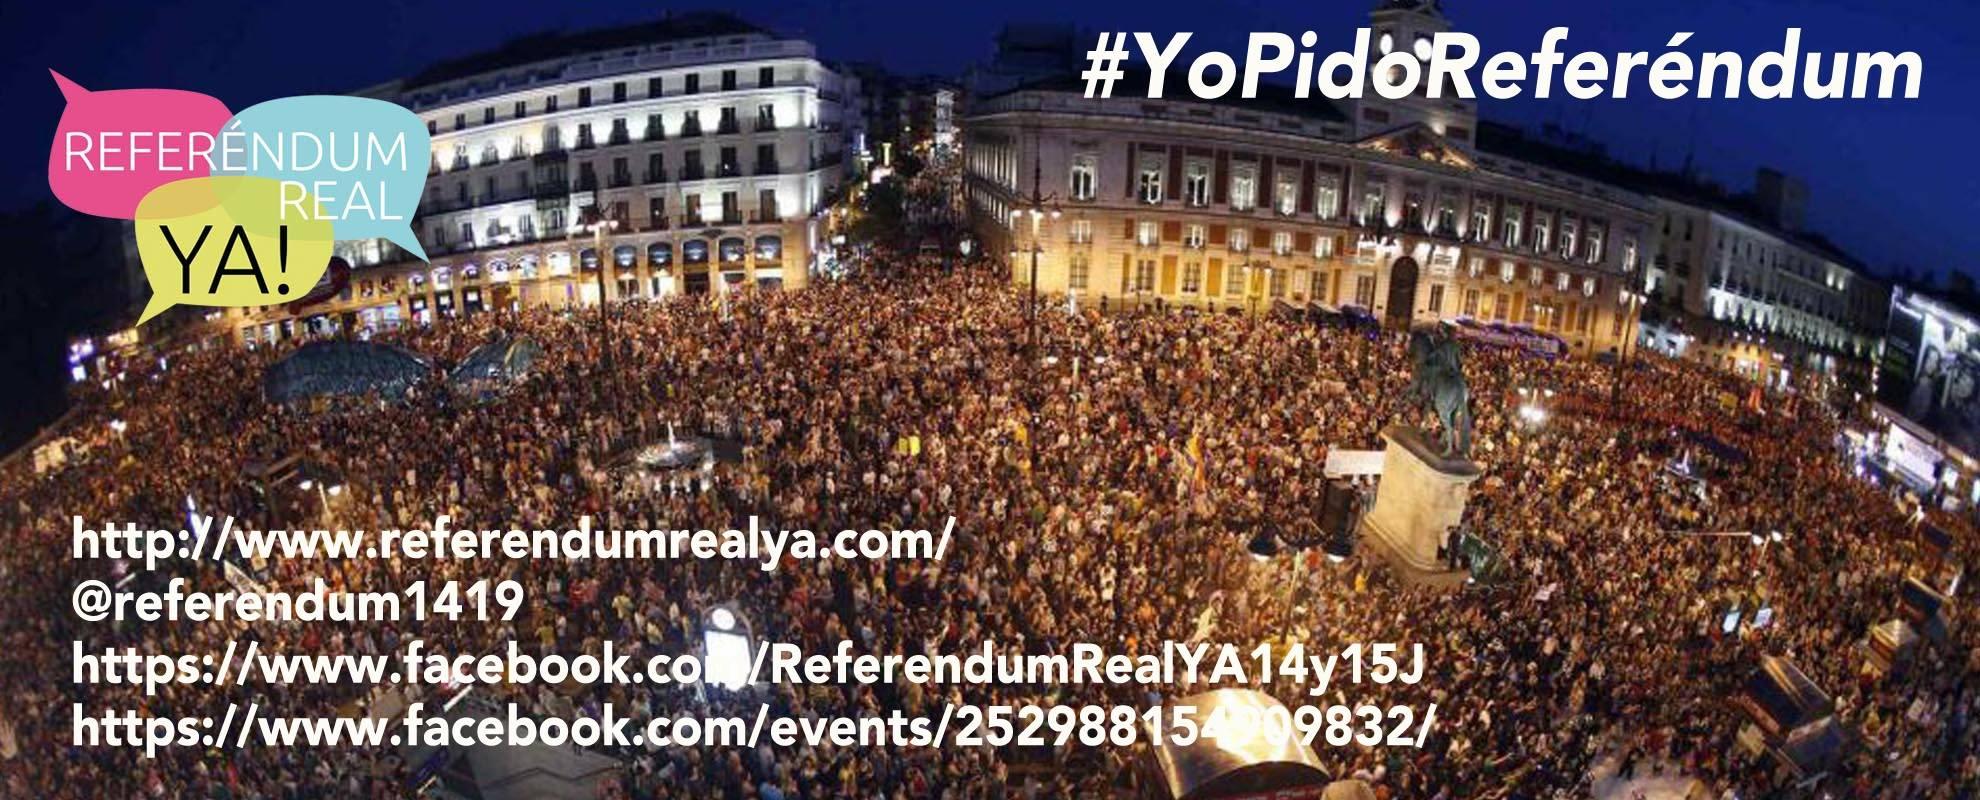 referendum real ya plaza